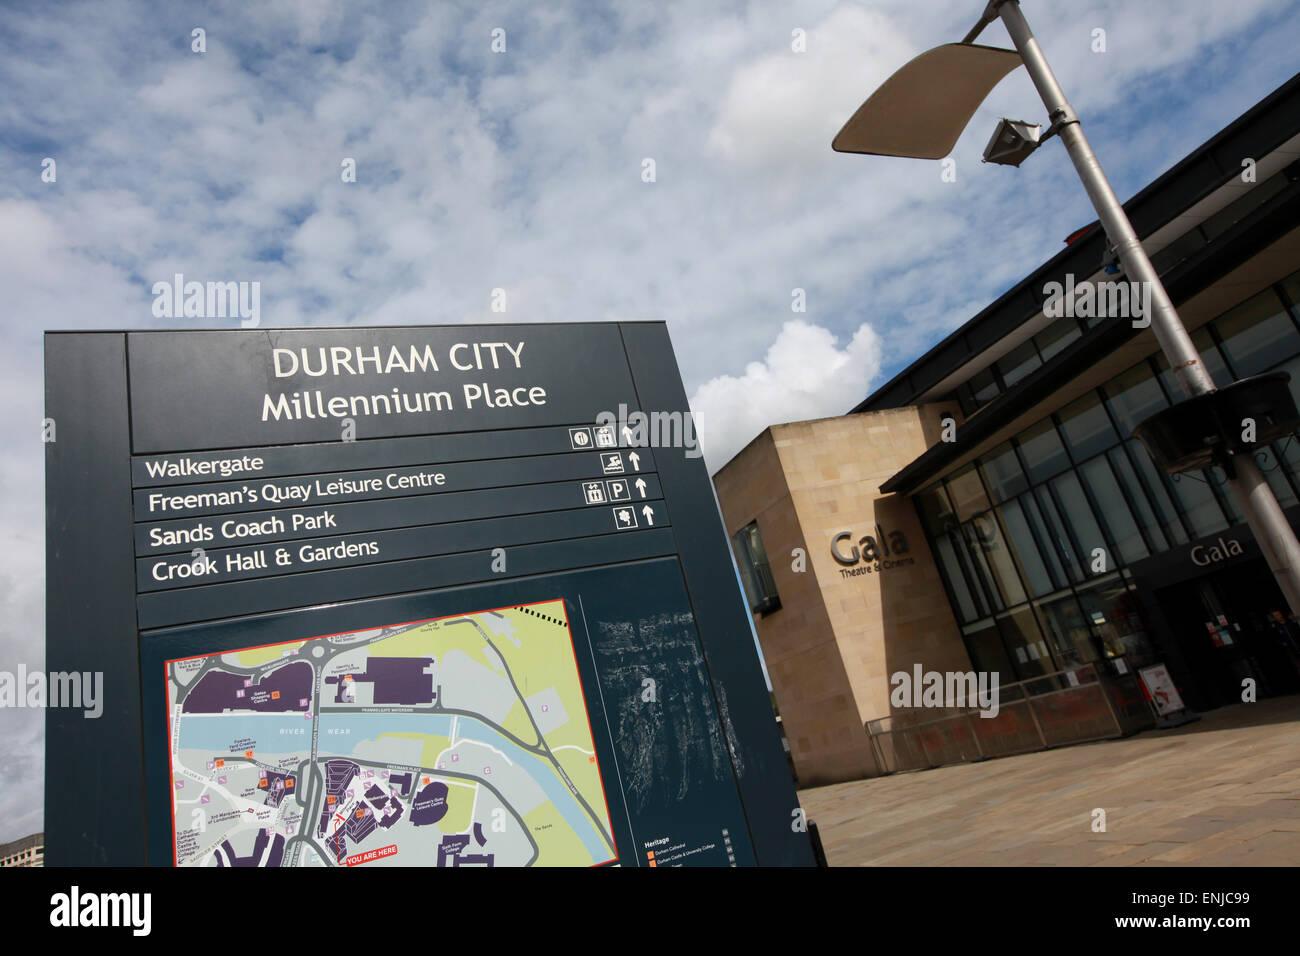 Gala Theatre Millennium Place Durham City Centre - Stock Image